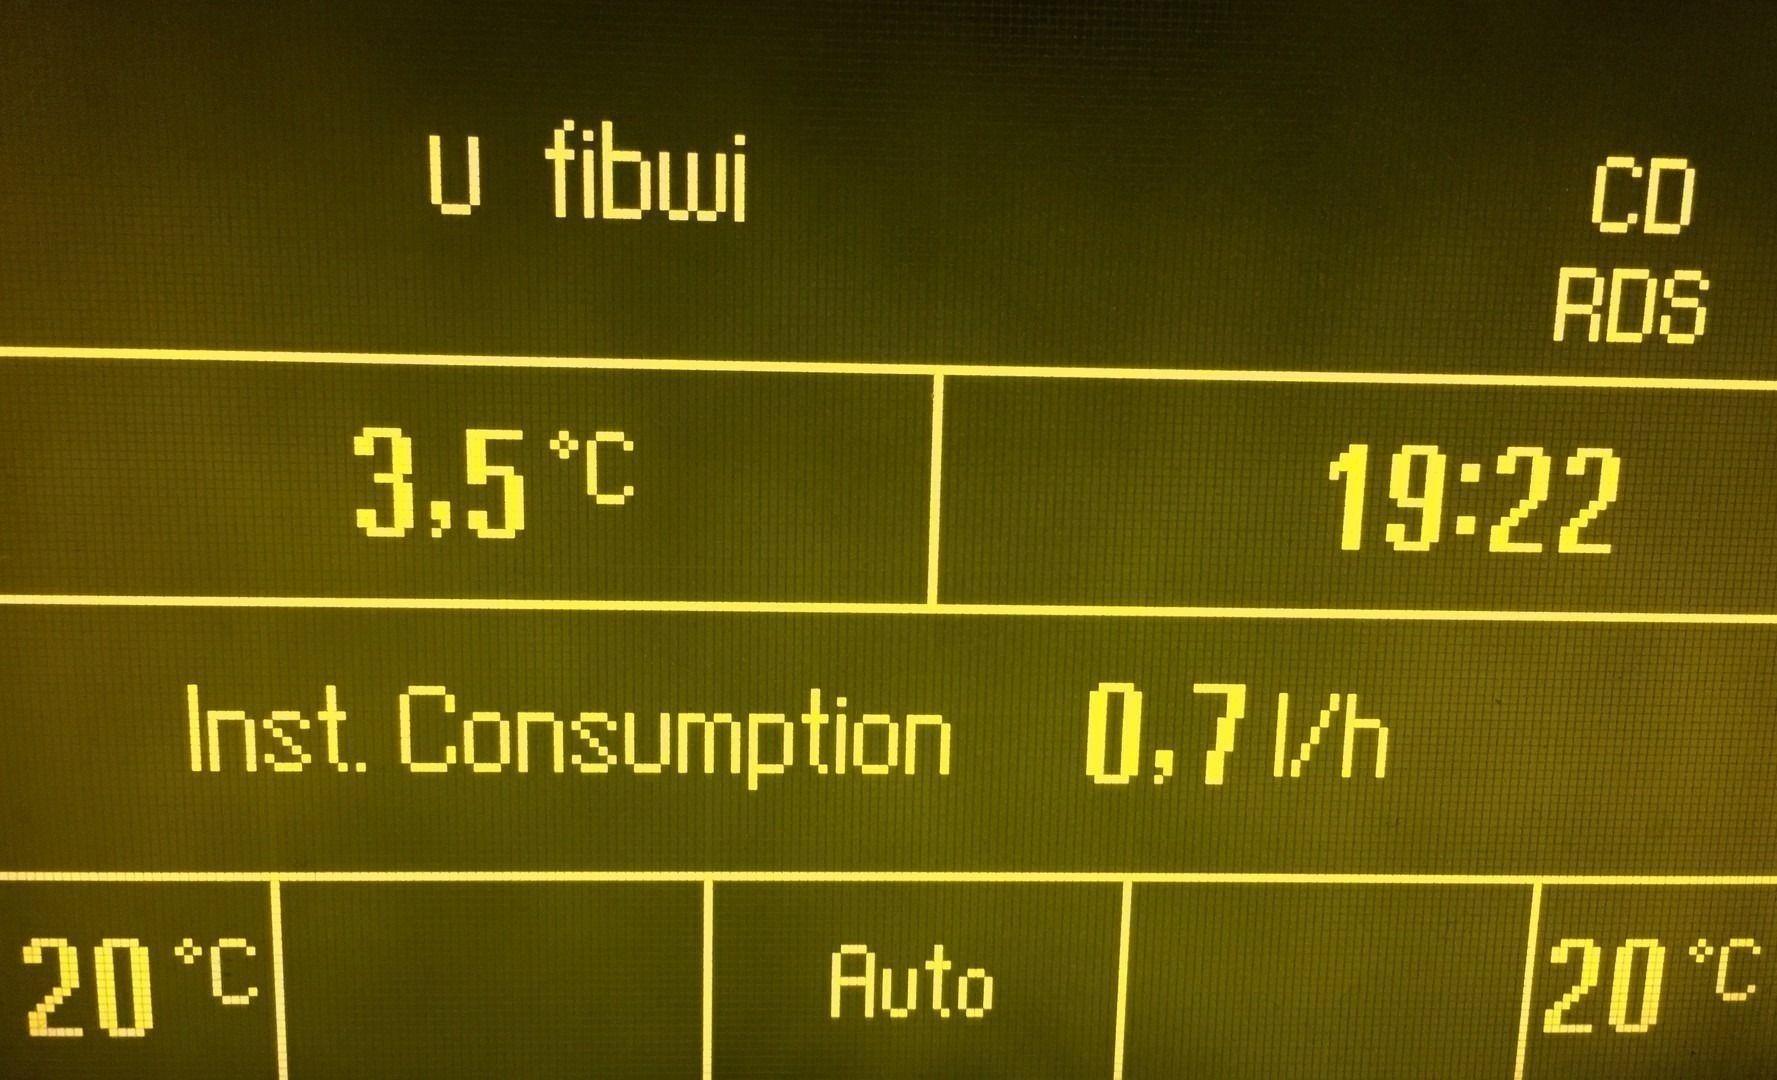 La ce e bun un diesel iarna?